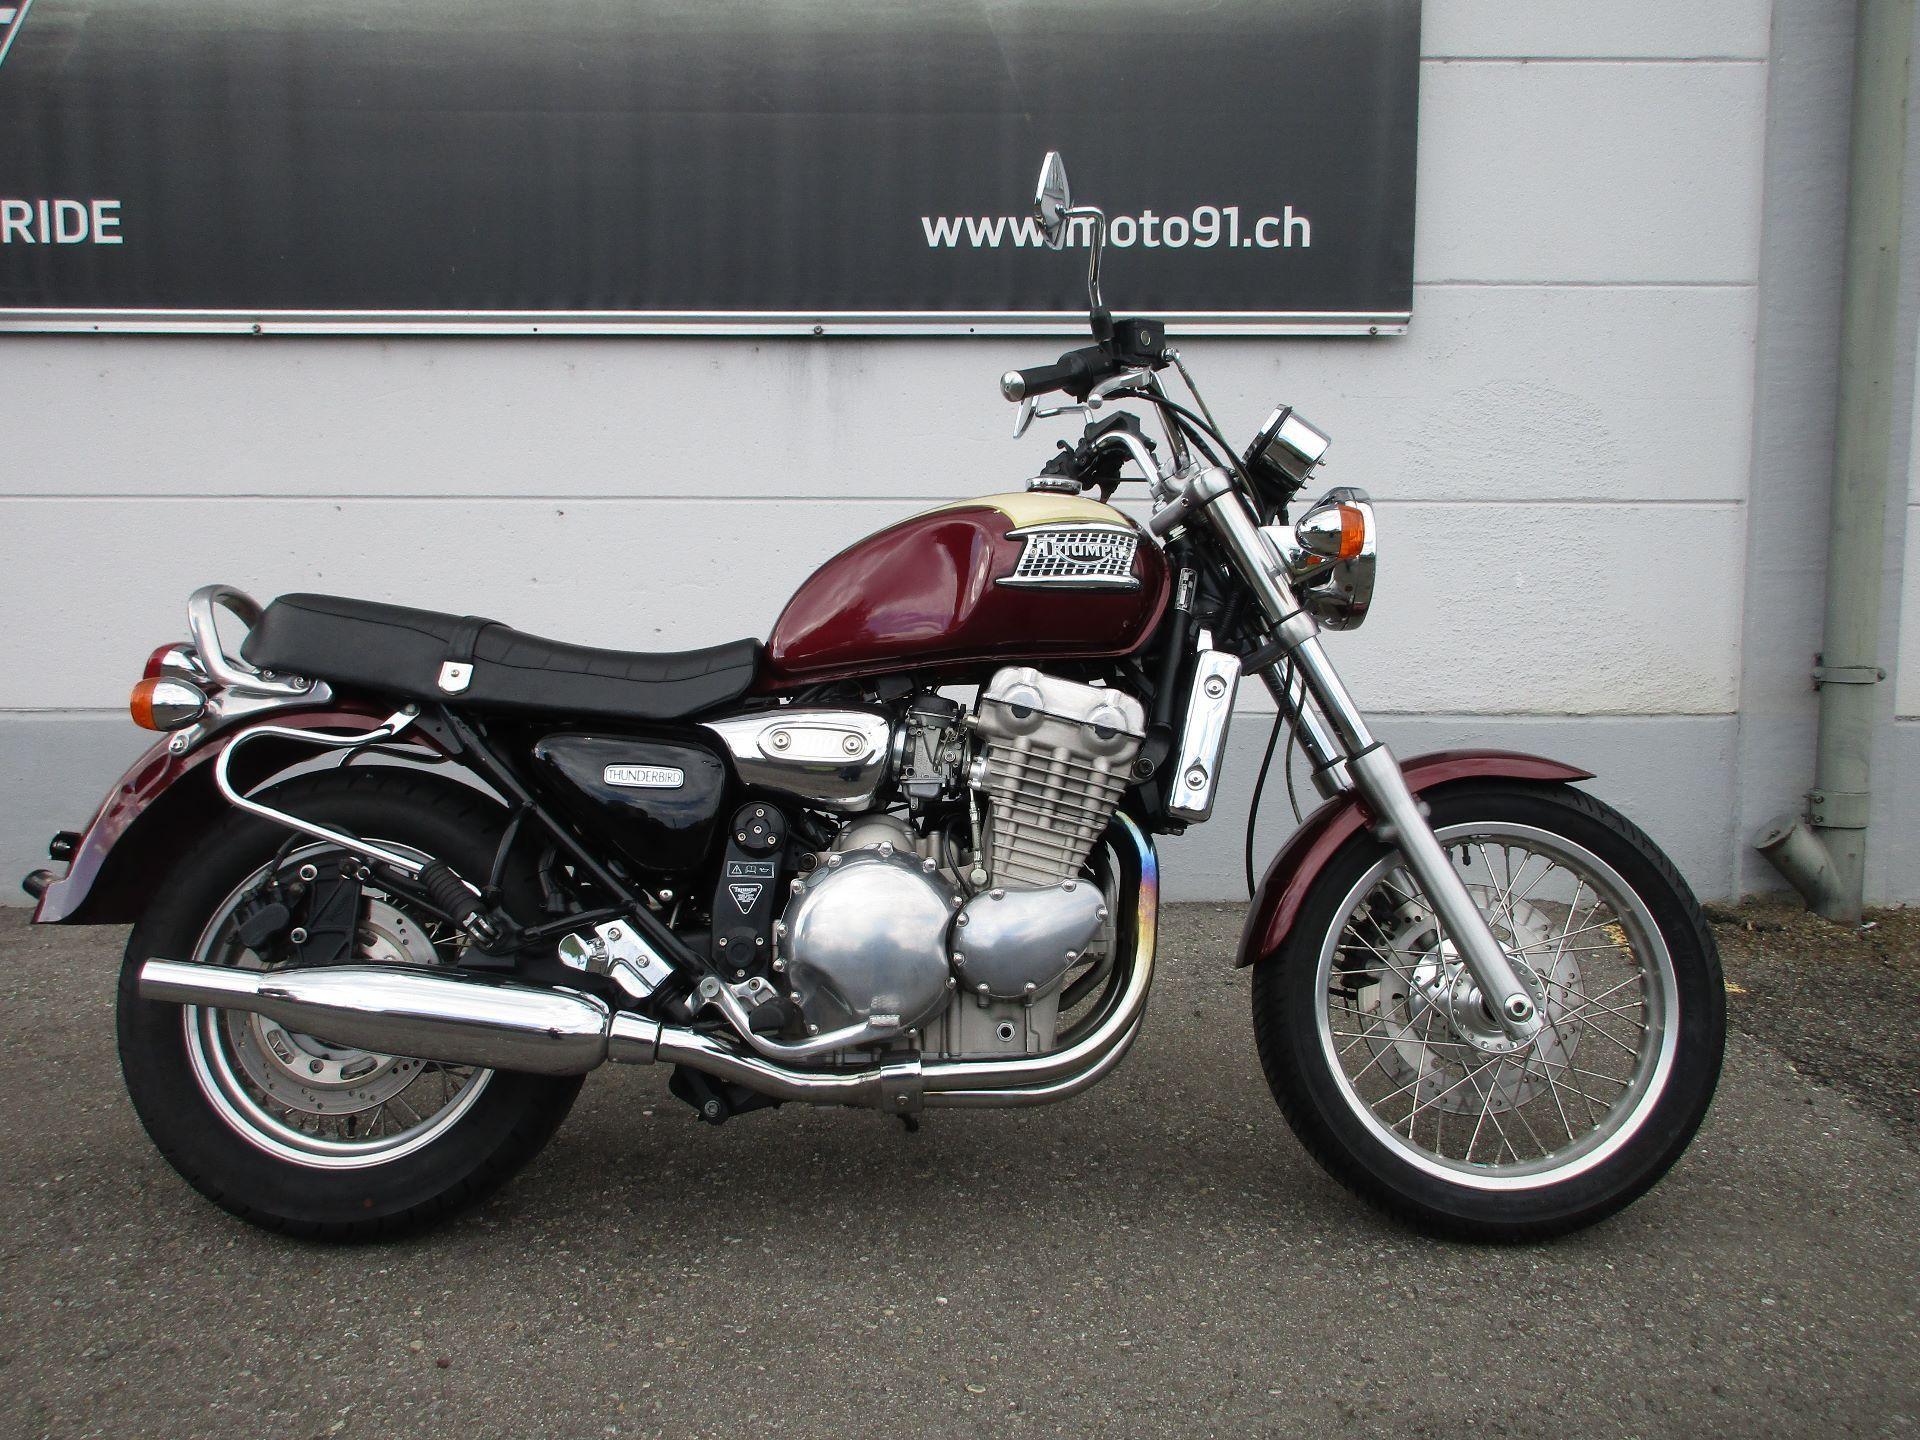 moto occasions acheter triumph thunderbird 900 the real one moto 91 ag h ri. Black Bedroom Furniture Sets. Home Design Ideas